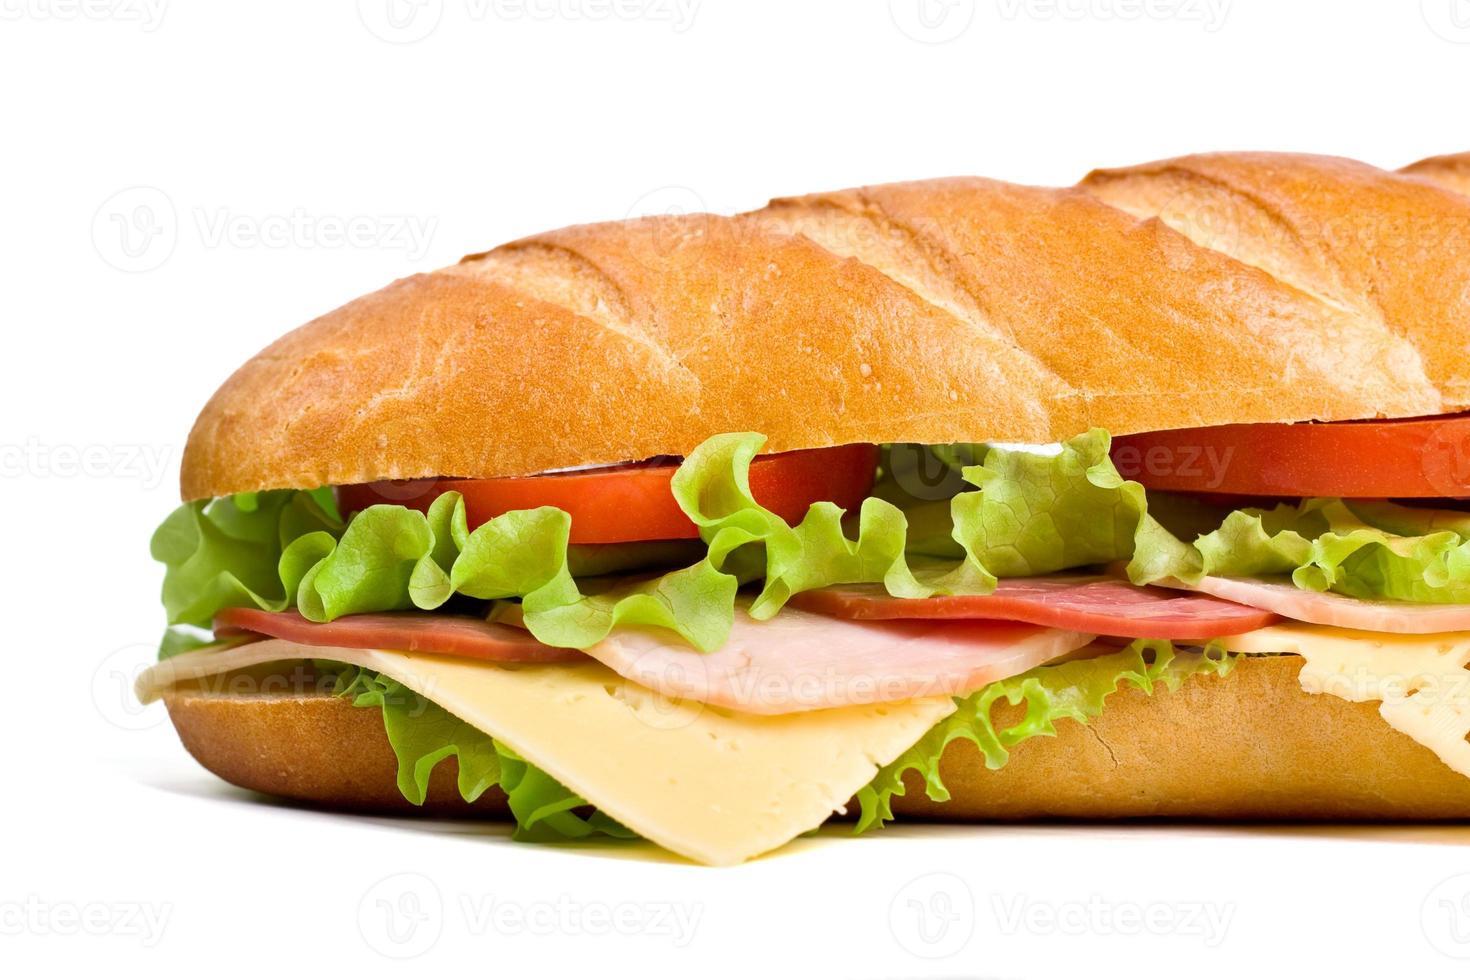 baguette de lechuga con queso y tomate foto